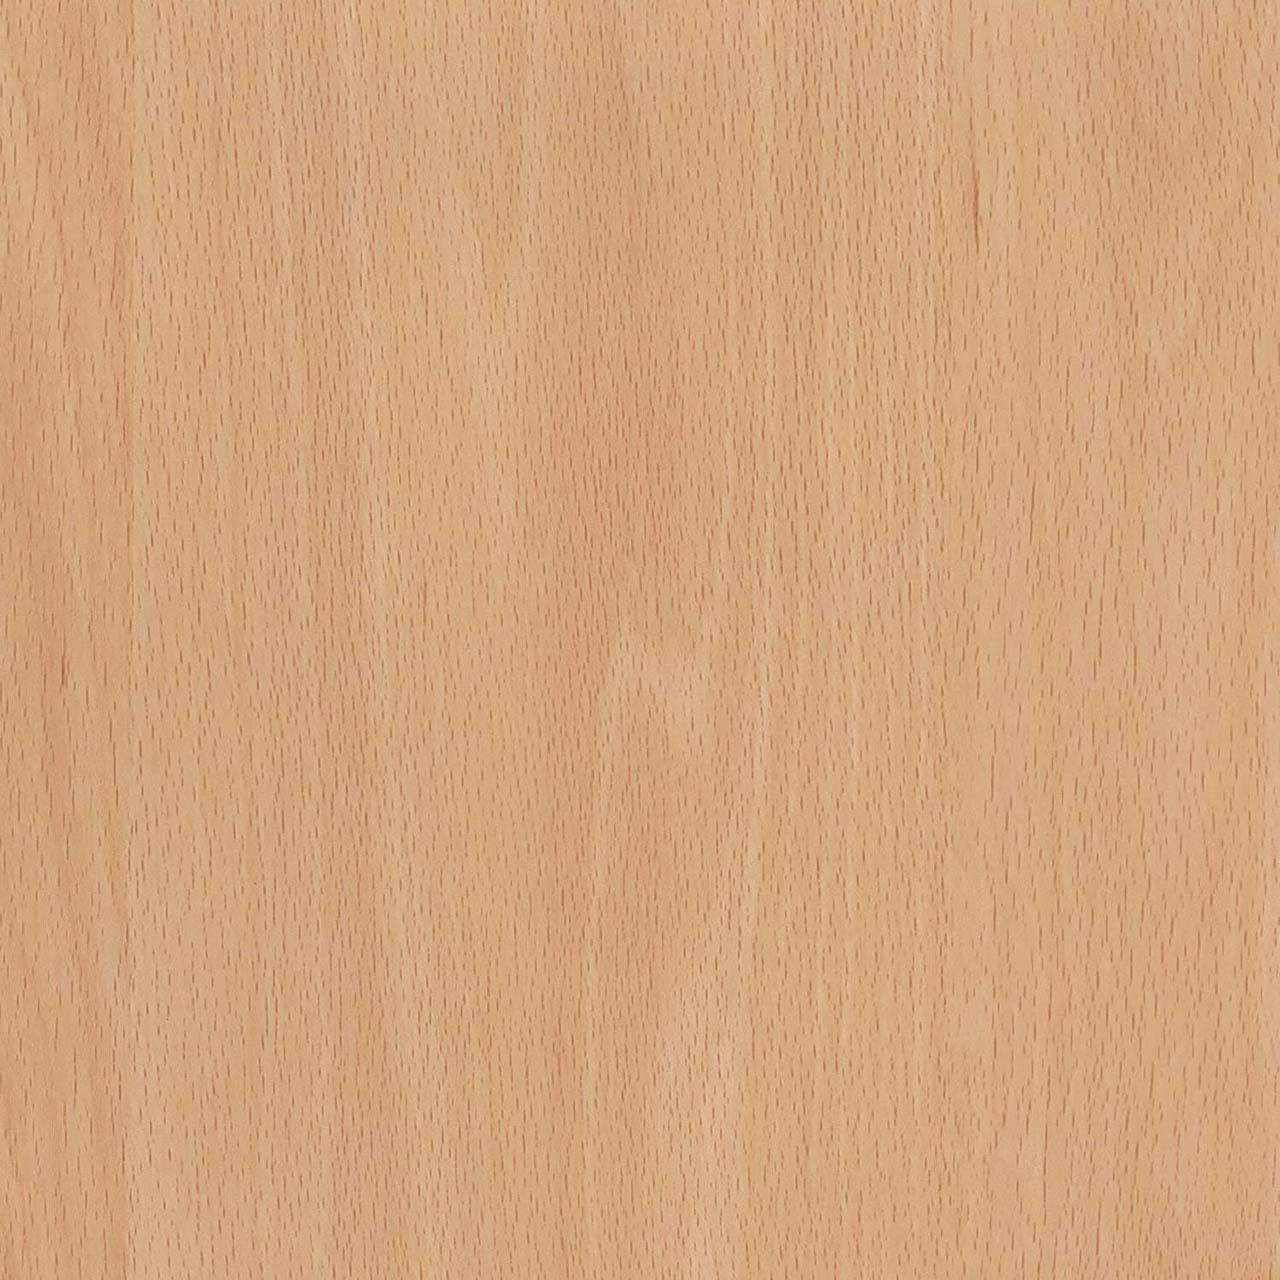 Almarie Beech effect laminate panel